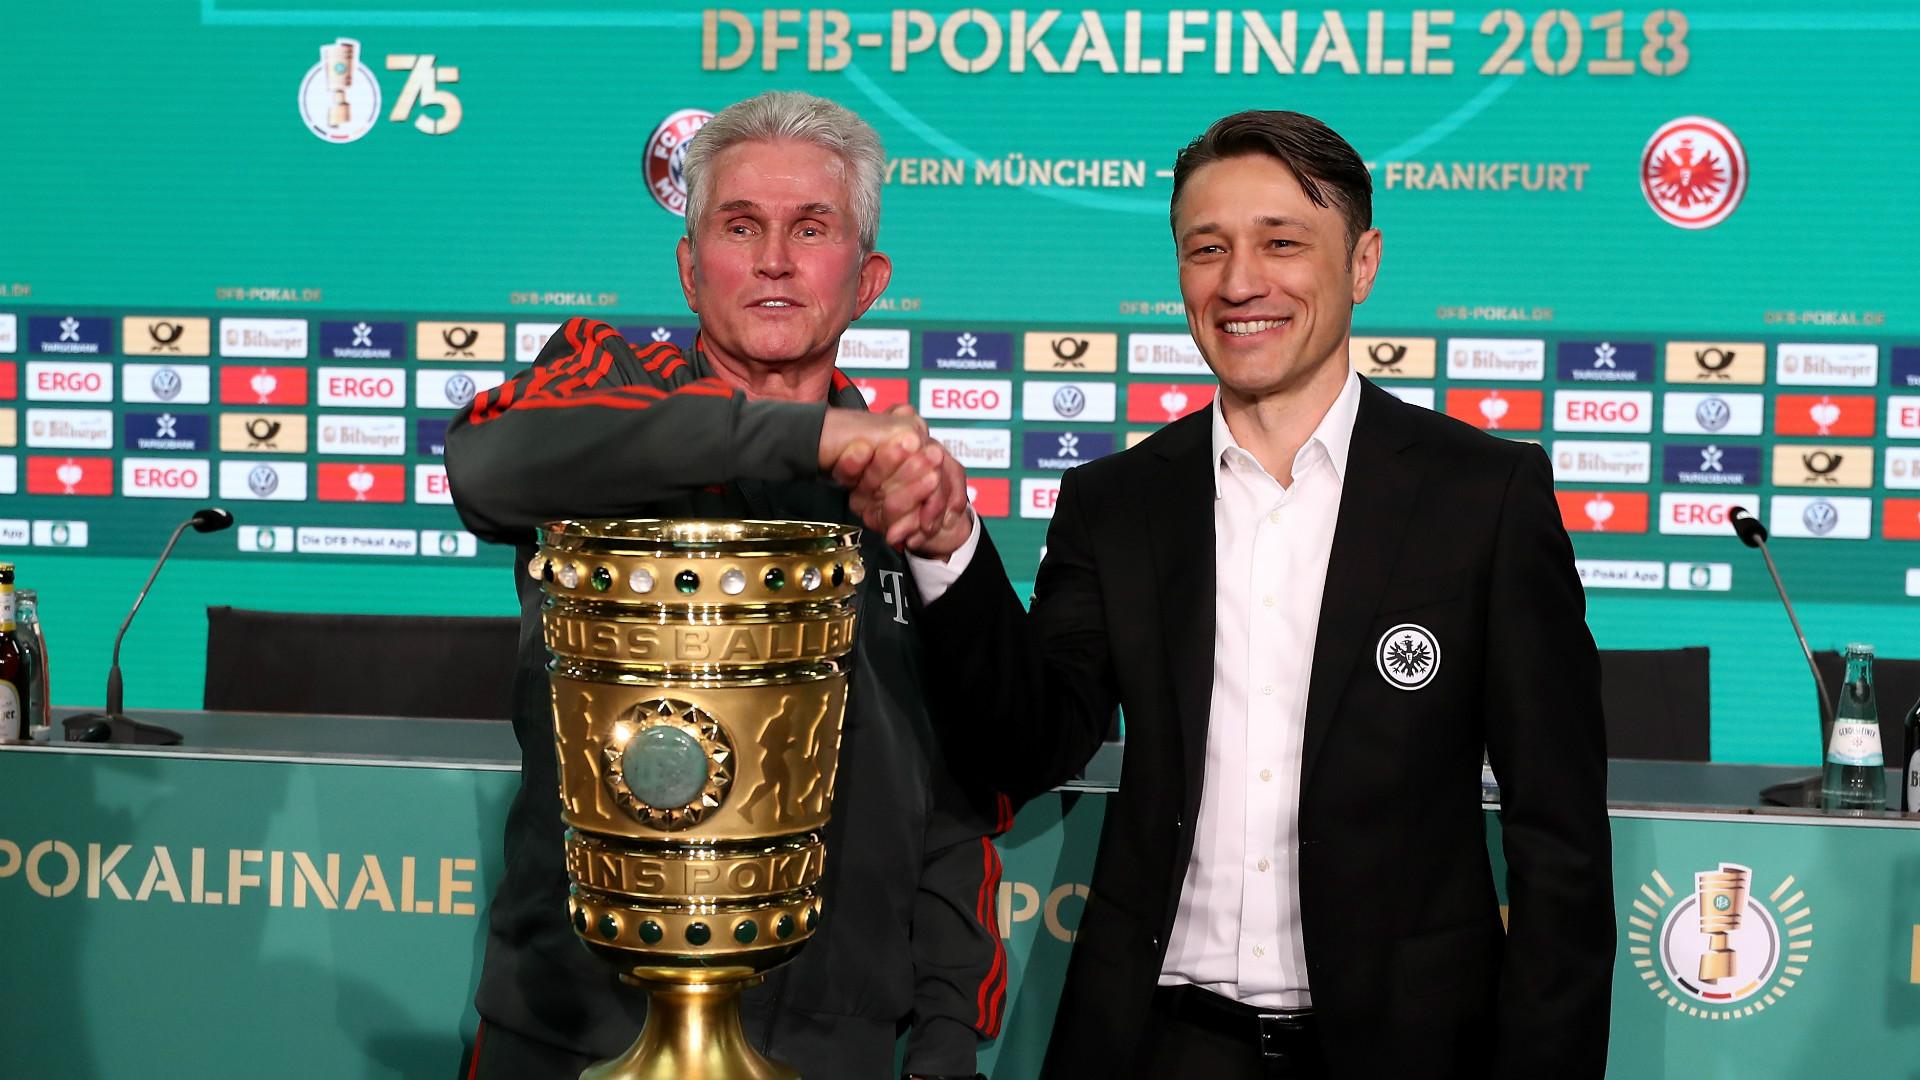 Jupp Heynckes Niko Kovac Bayern Munchen Eintracht Frankfurt DF